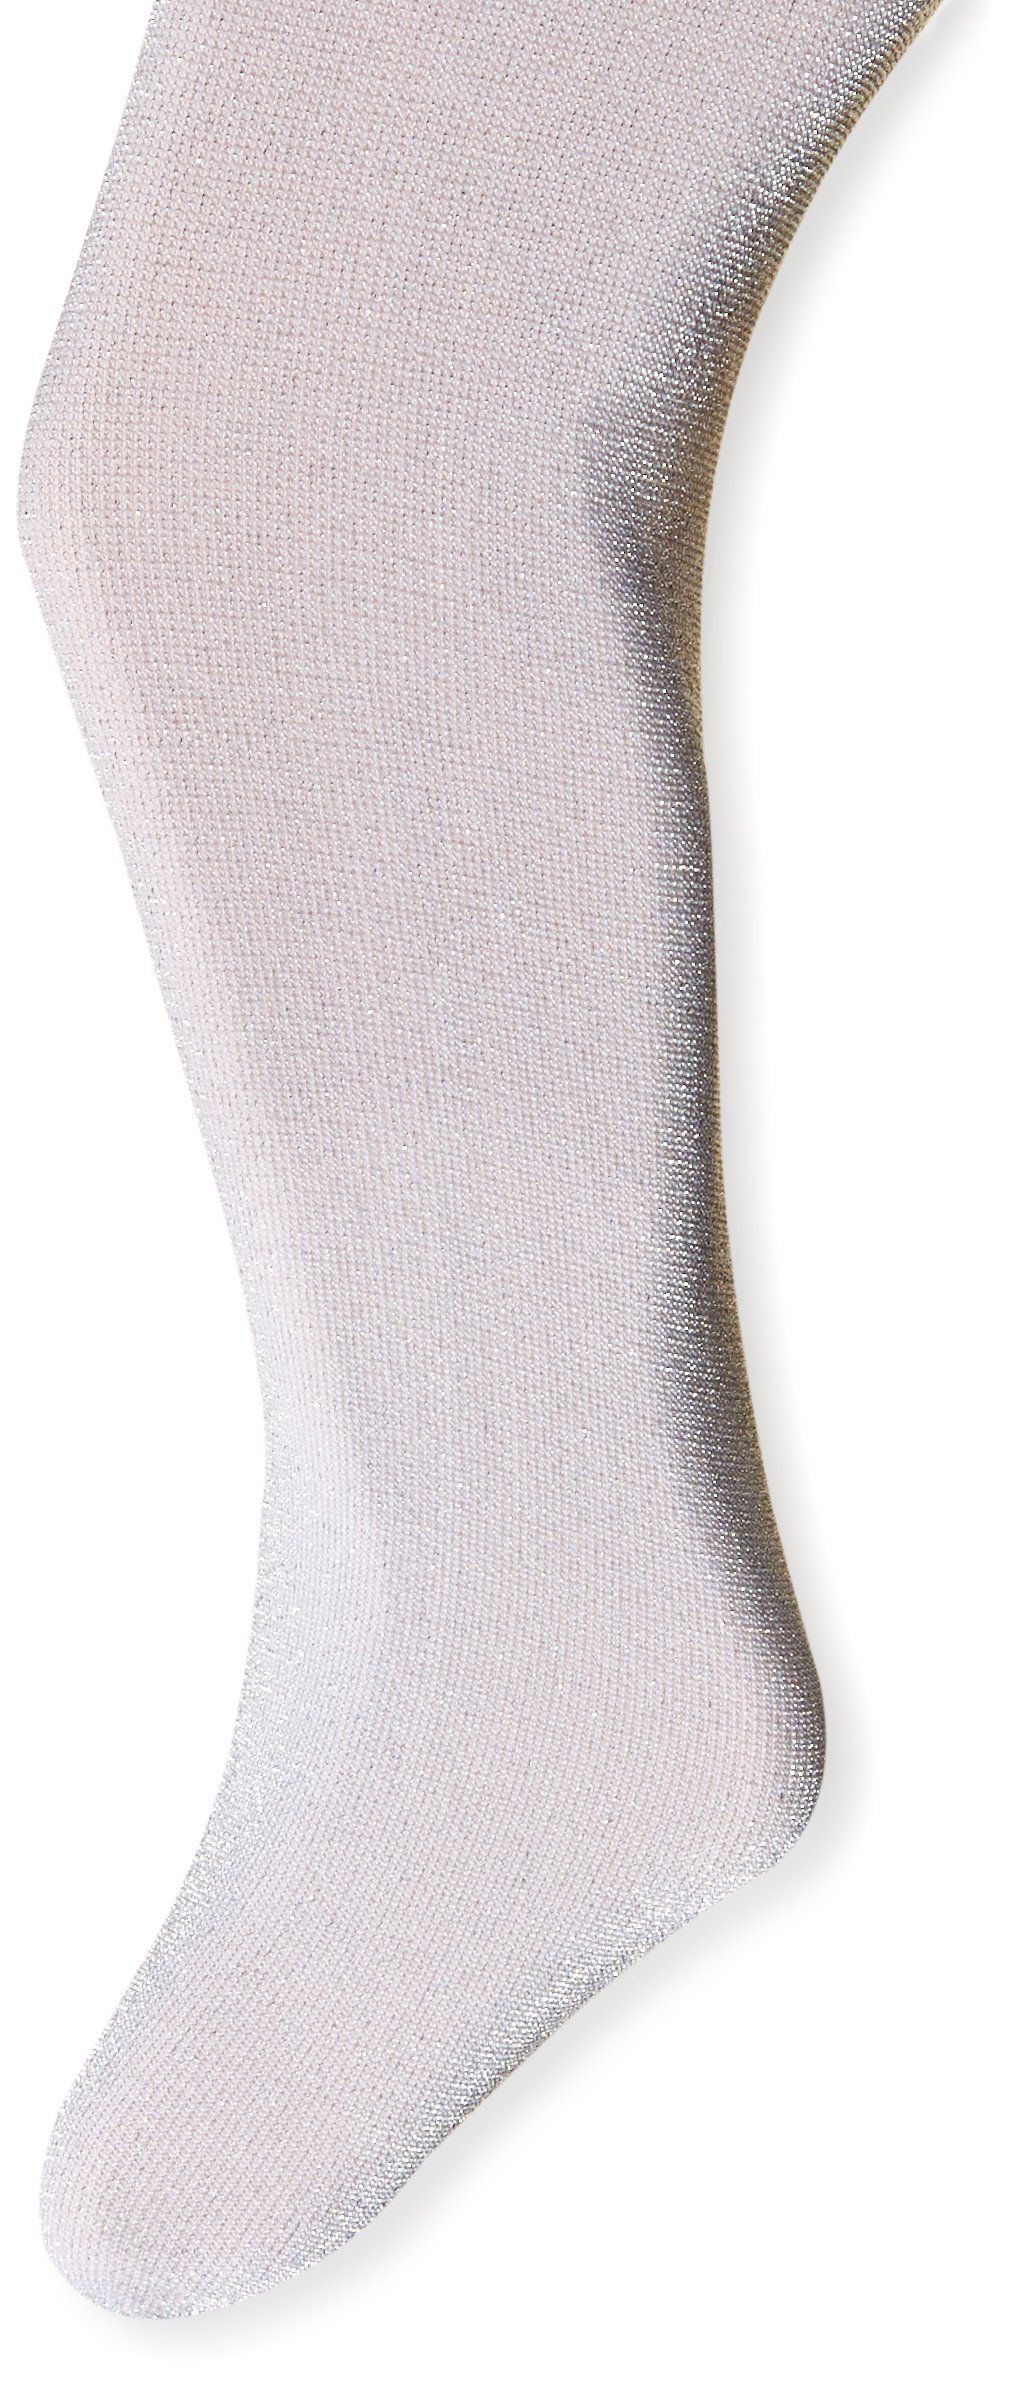 c5ad757d4 Jefferies Socks Big Girls  Sparkly Tights